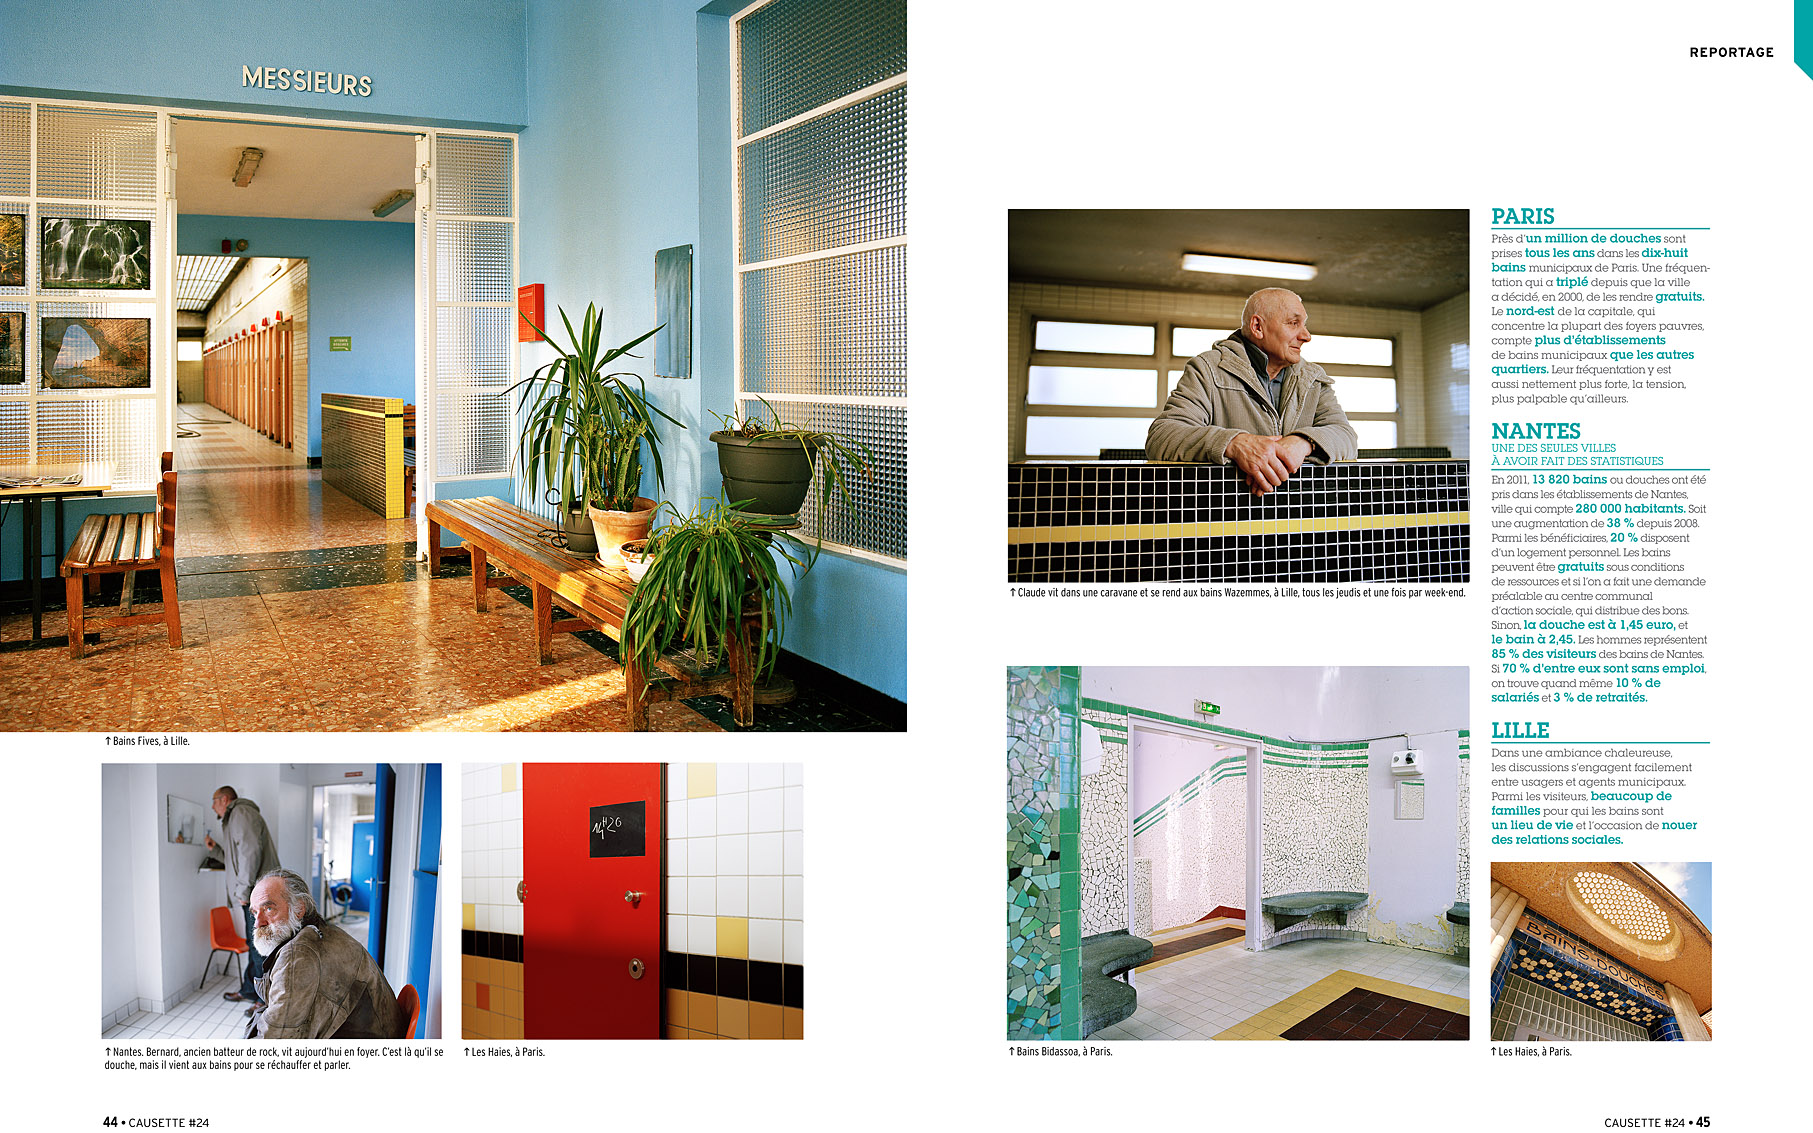 Bains-Douches, Causette #24